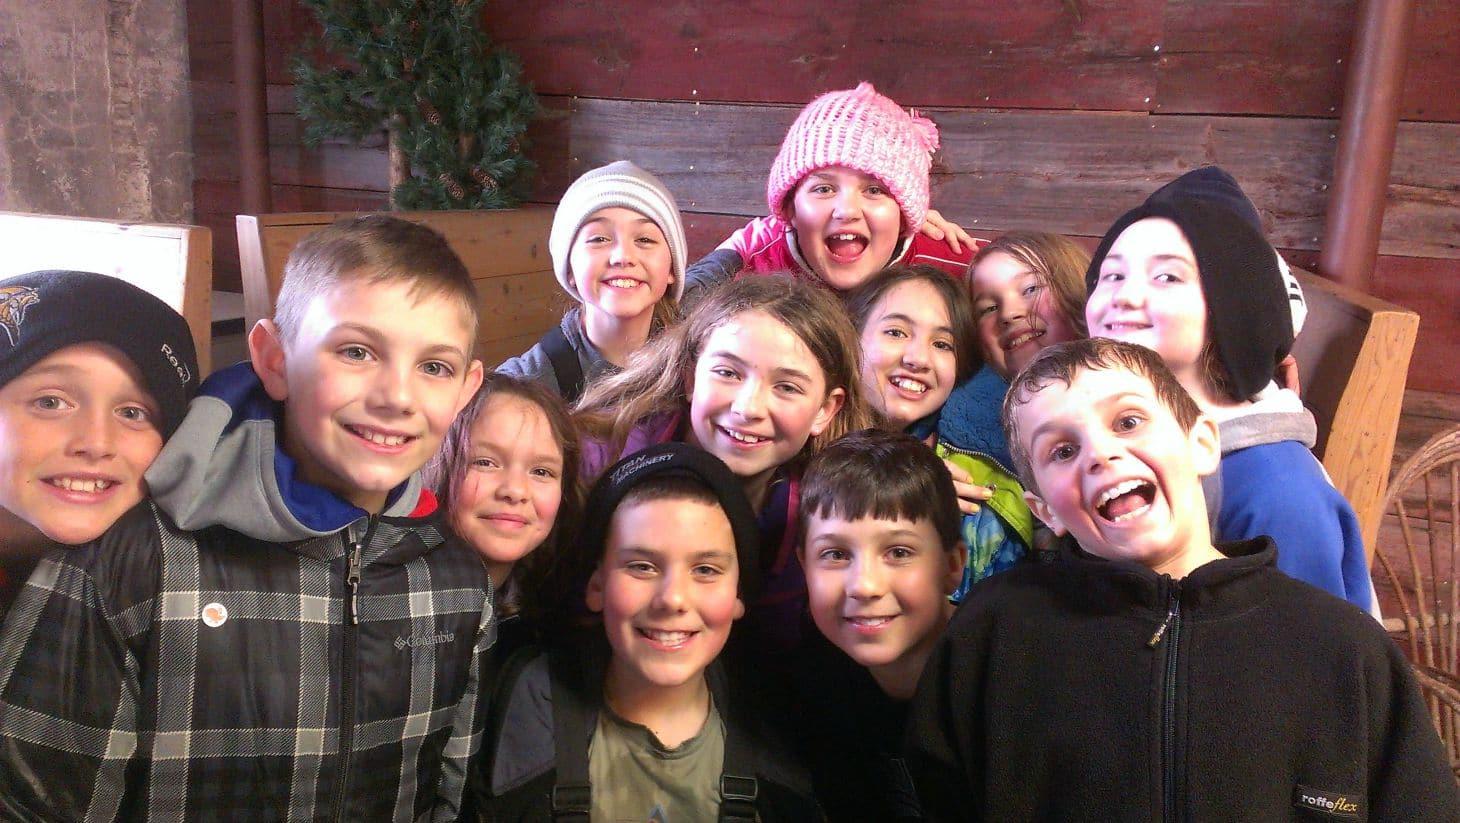 Winter School Day: Snowshoe, Sledding, XC Skiing